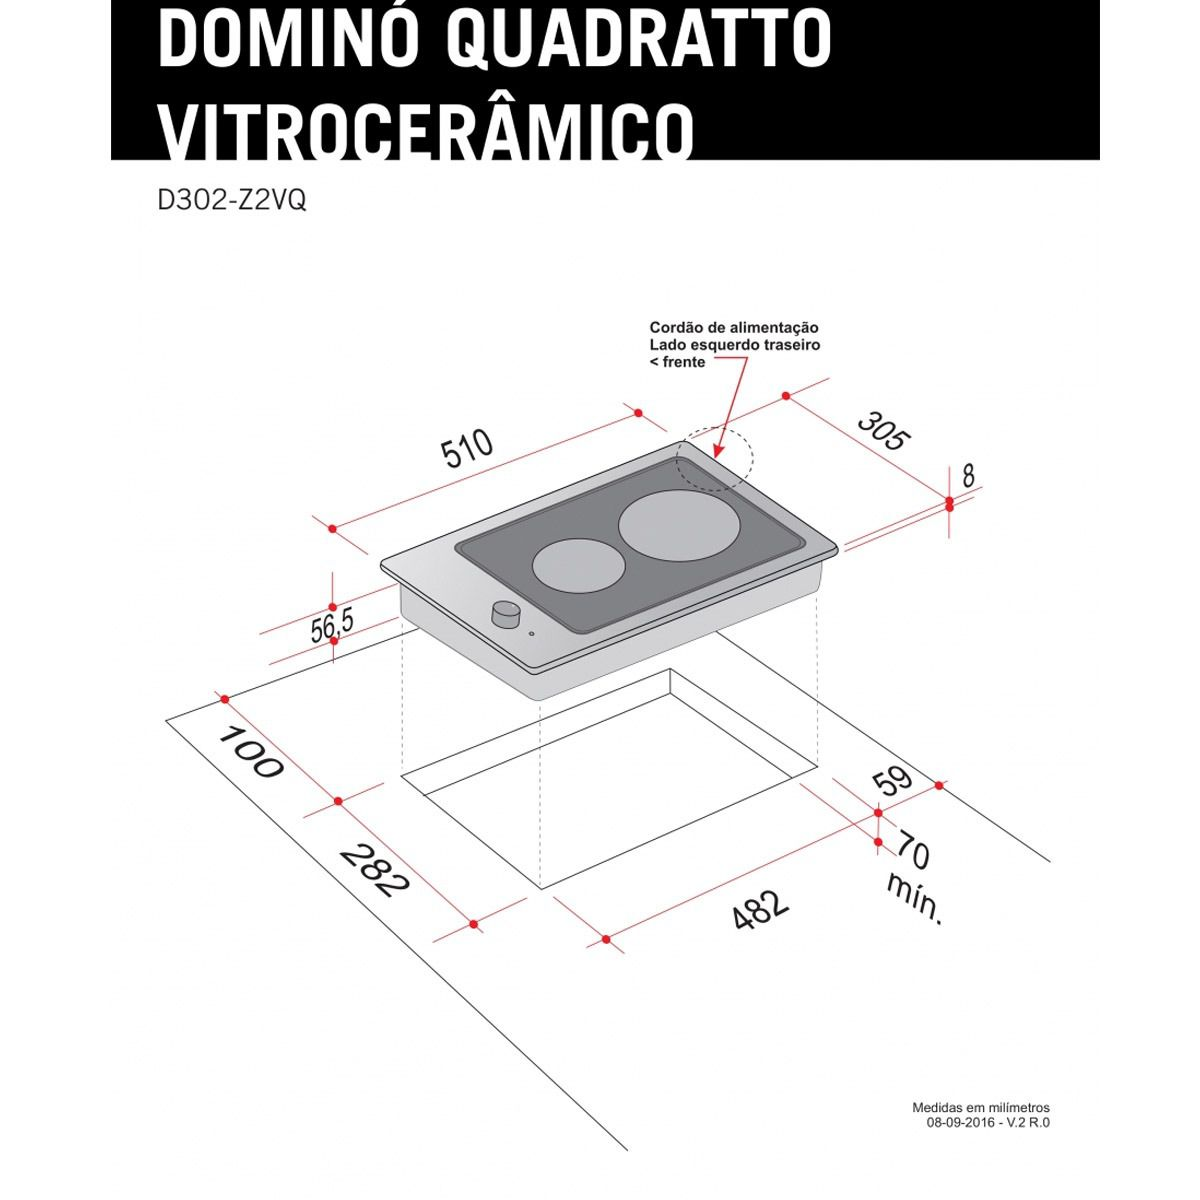 Dominó Elettromec Quadratto Vitrocerâmico 2 Bocas 220V